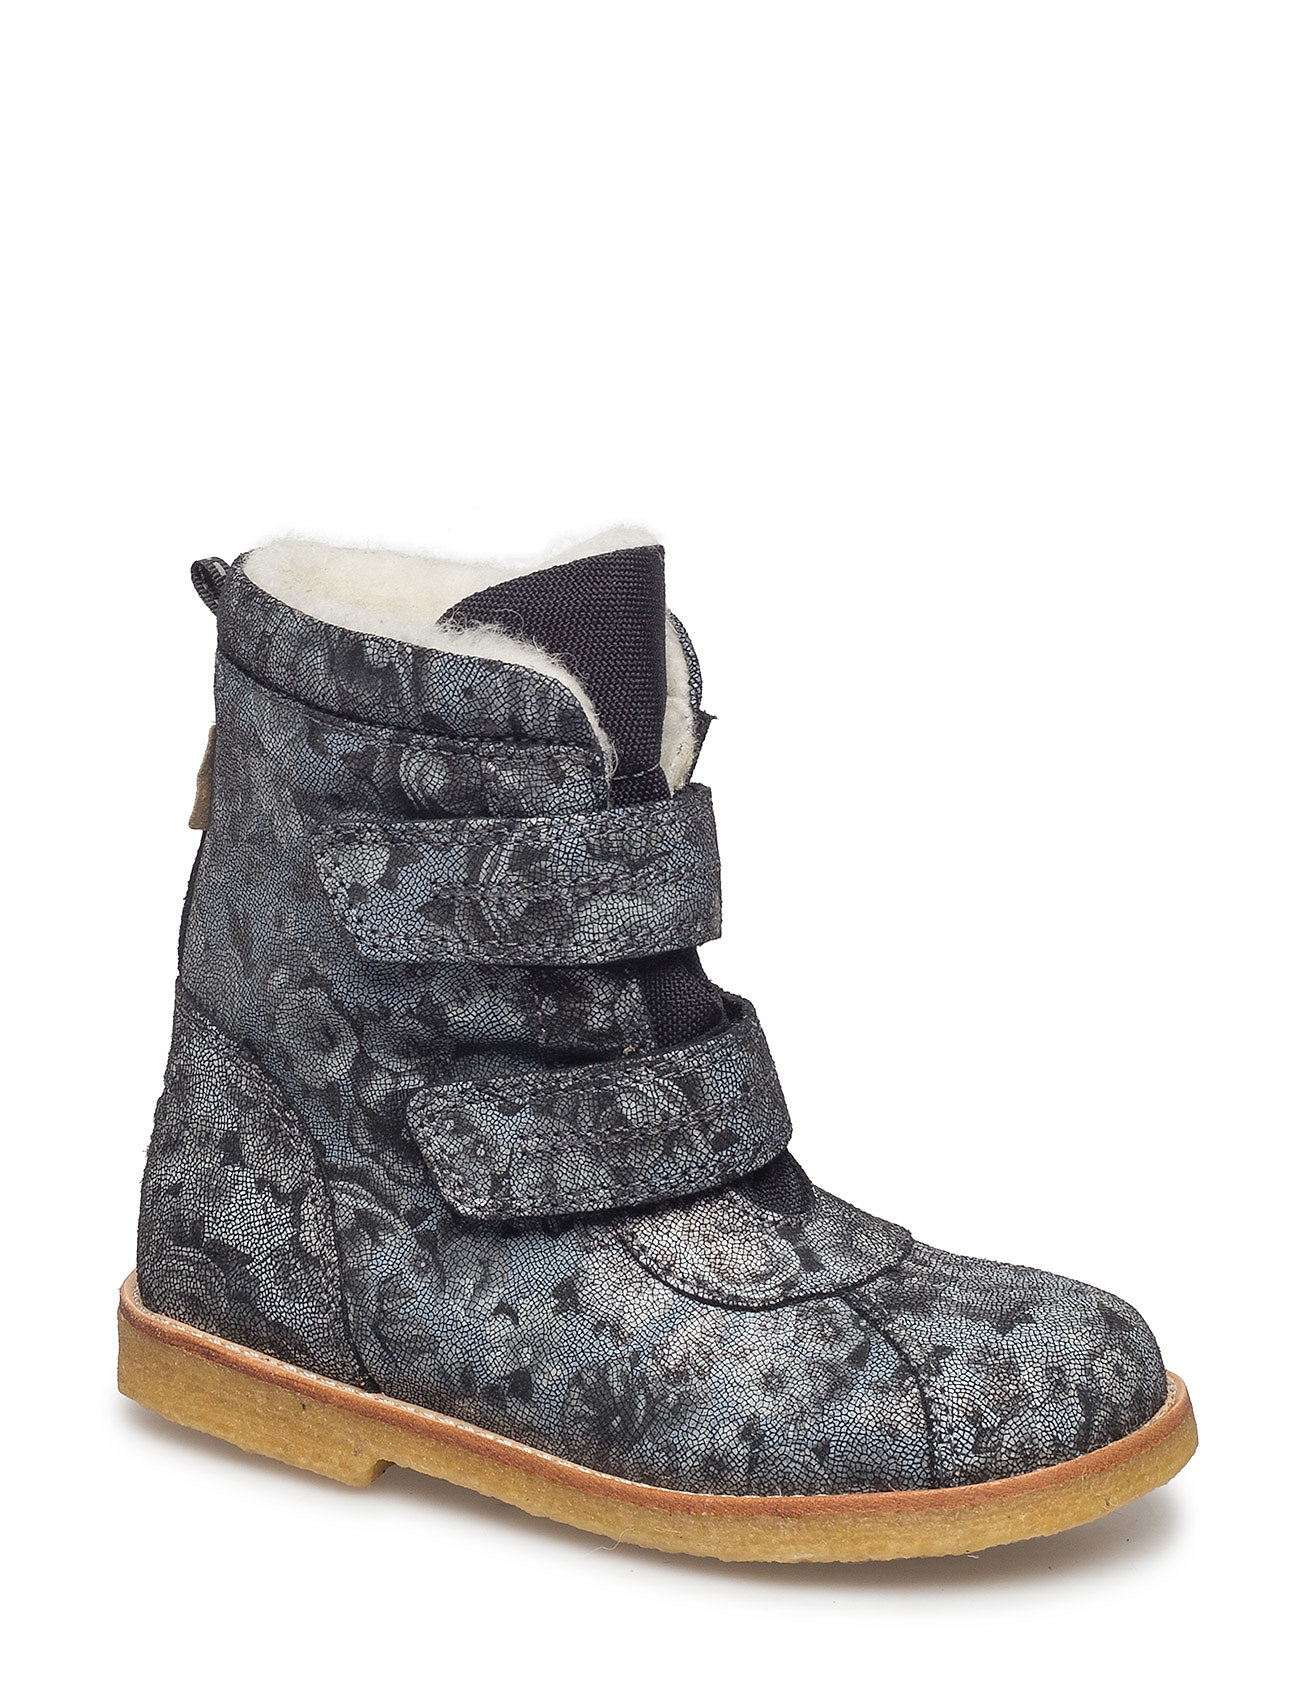 dfc62d95fb4 Arauto RAP støvler – Tex Boot With Velcro til børn i 58-BLACK ...